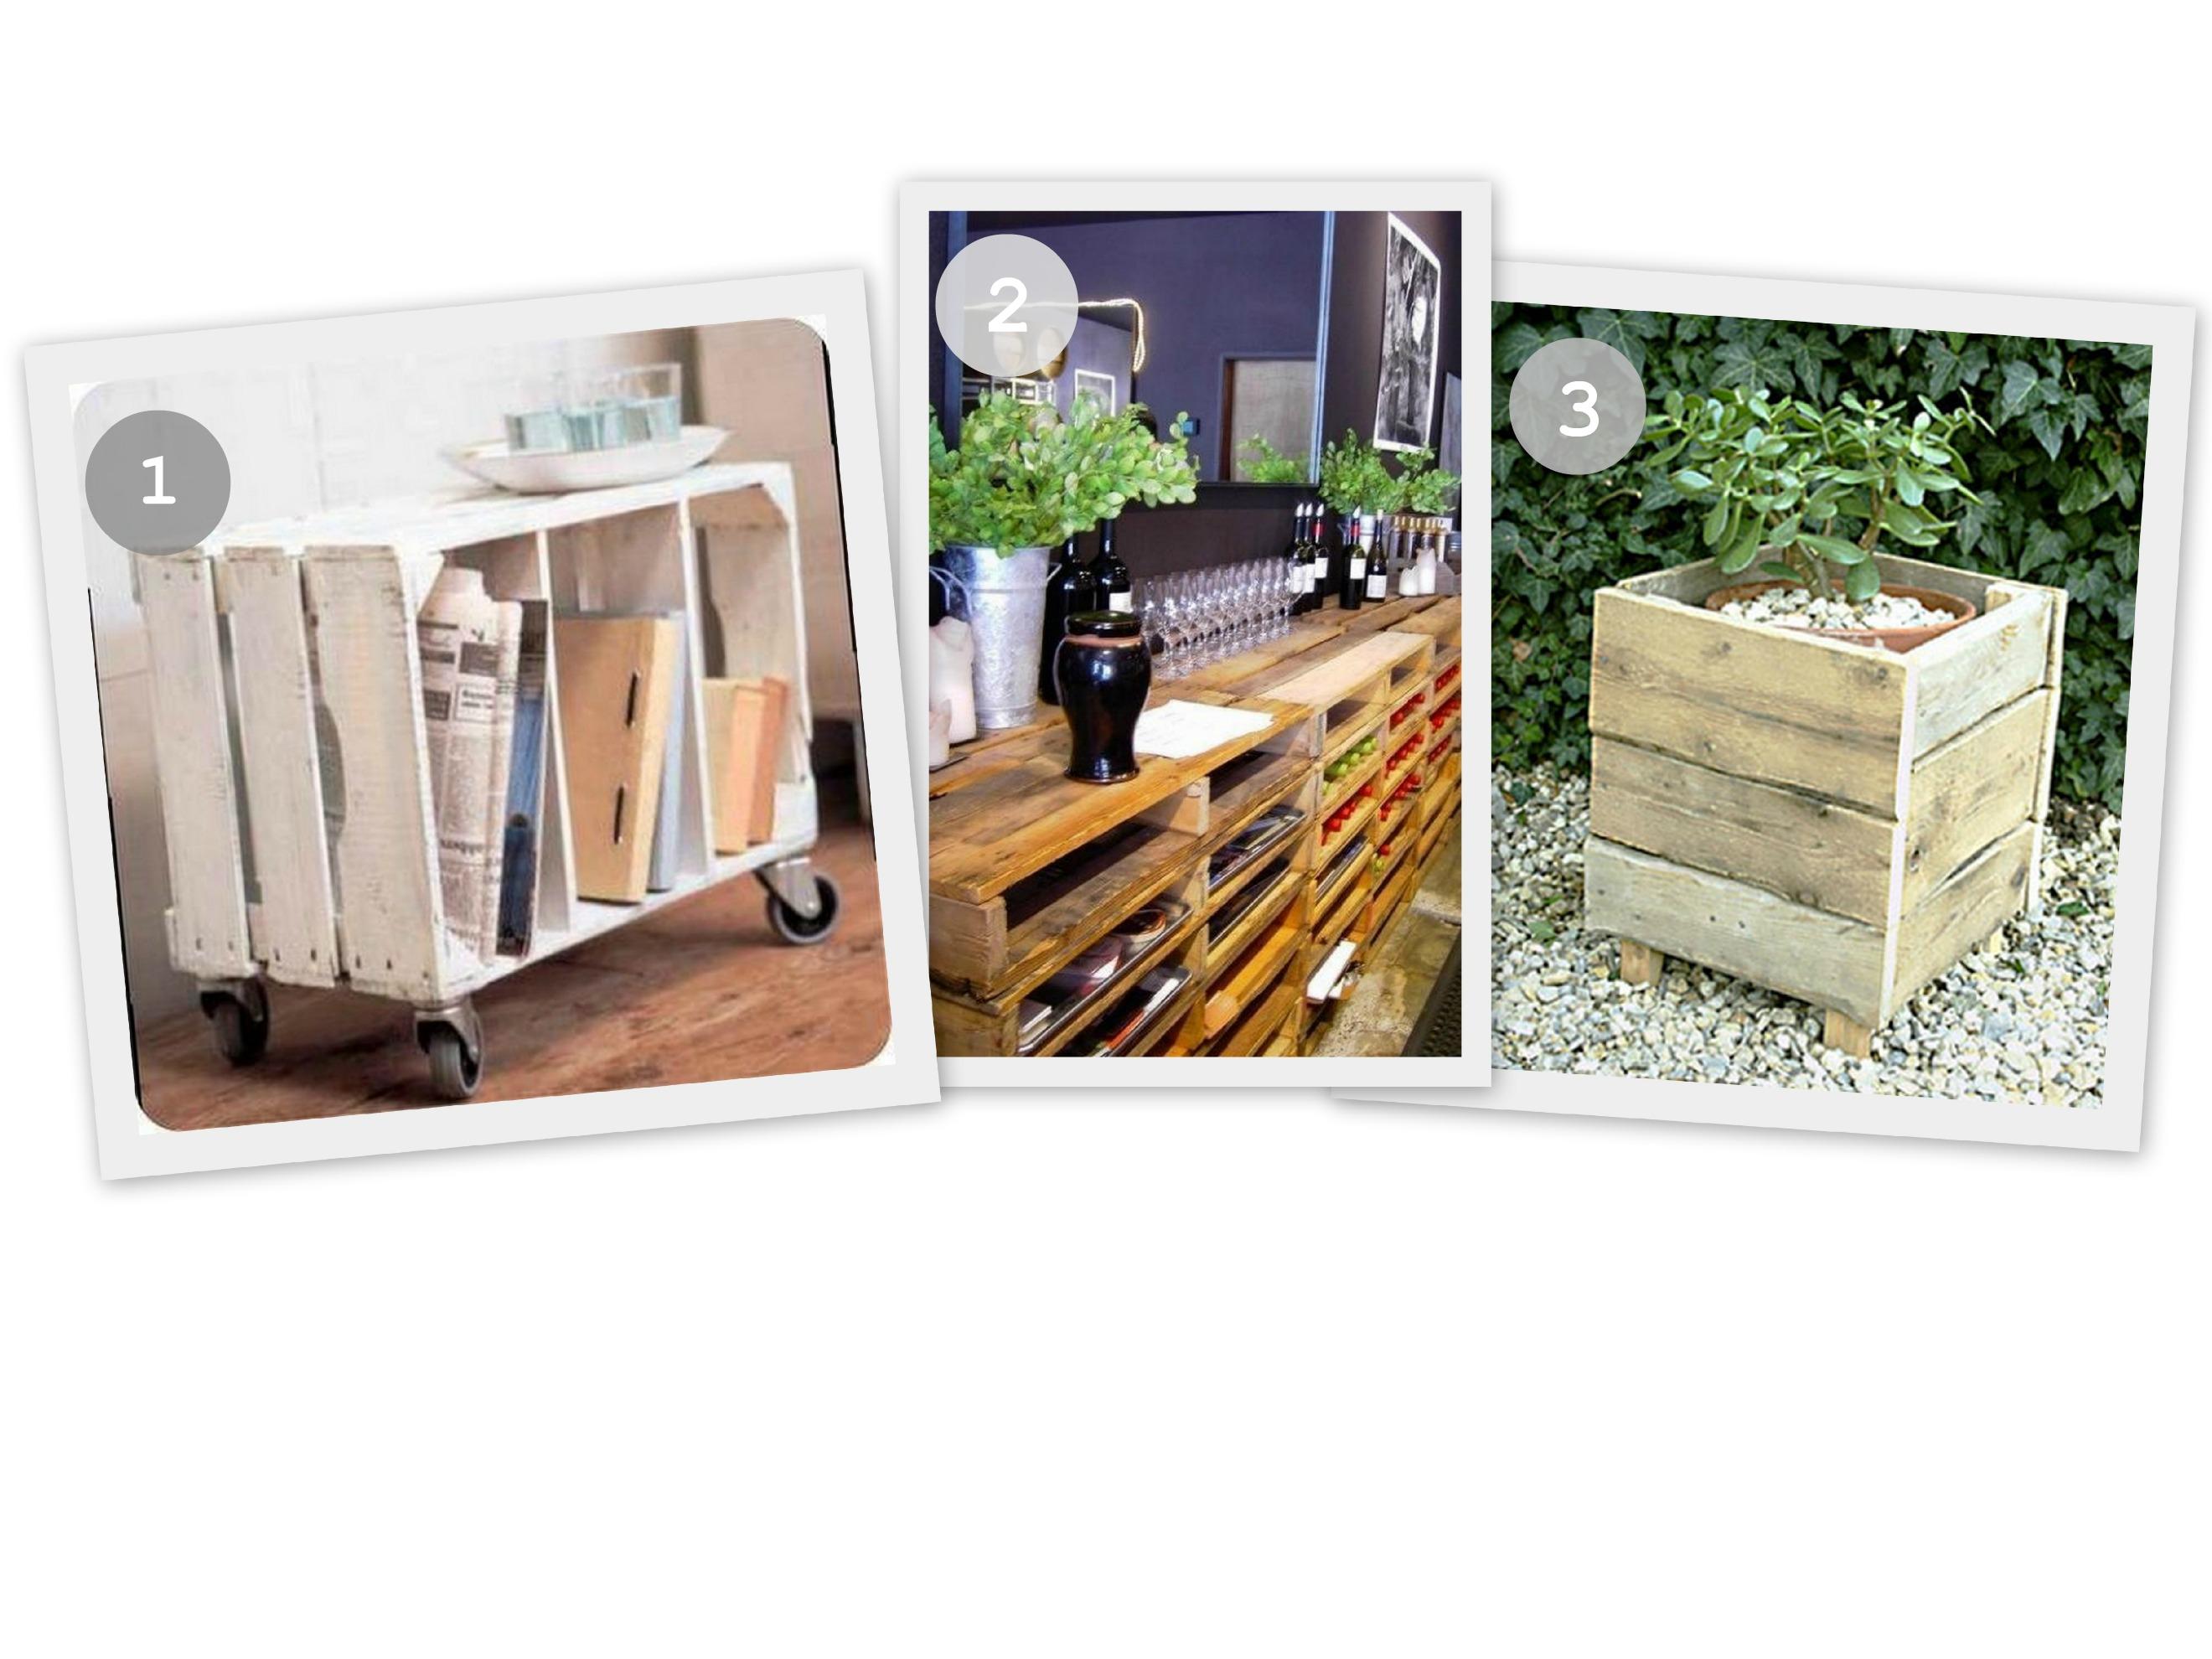 modulare mobel aus europaletten haus design m bel ideen. Black Bedroom Furniture Sets. Home Design Ideas